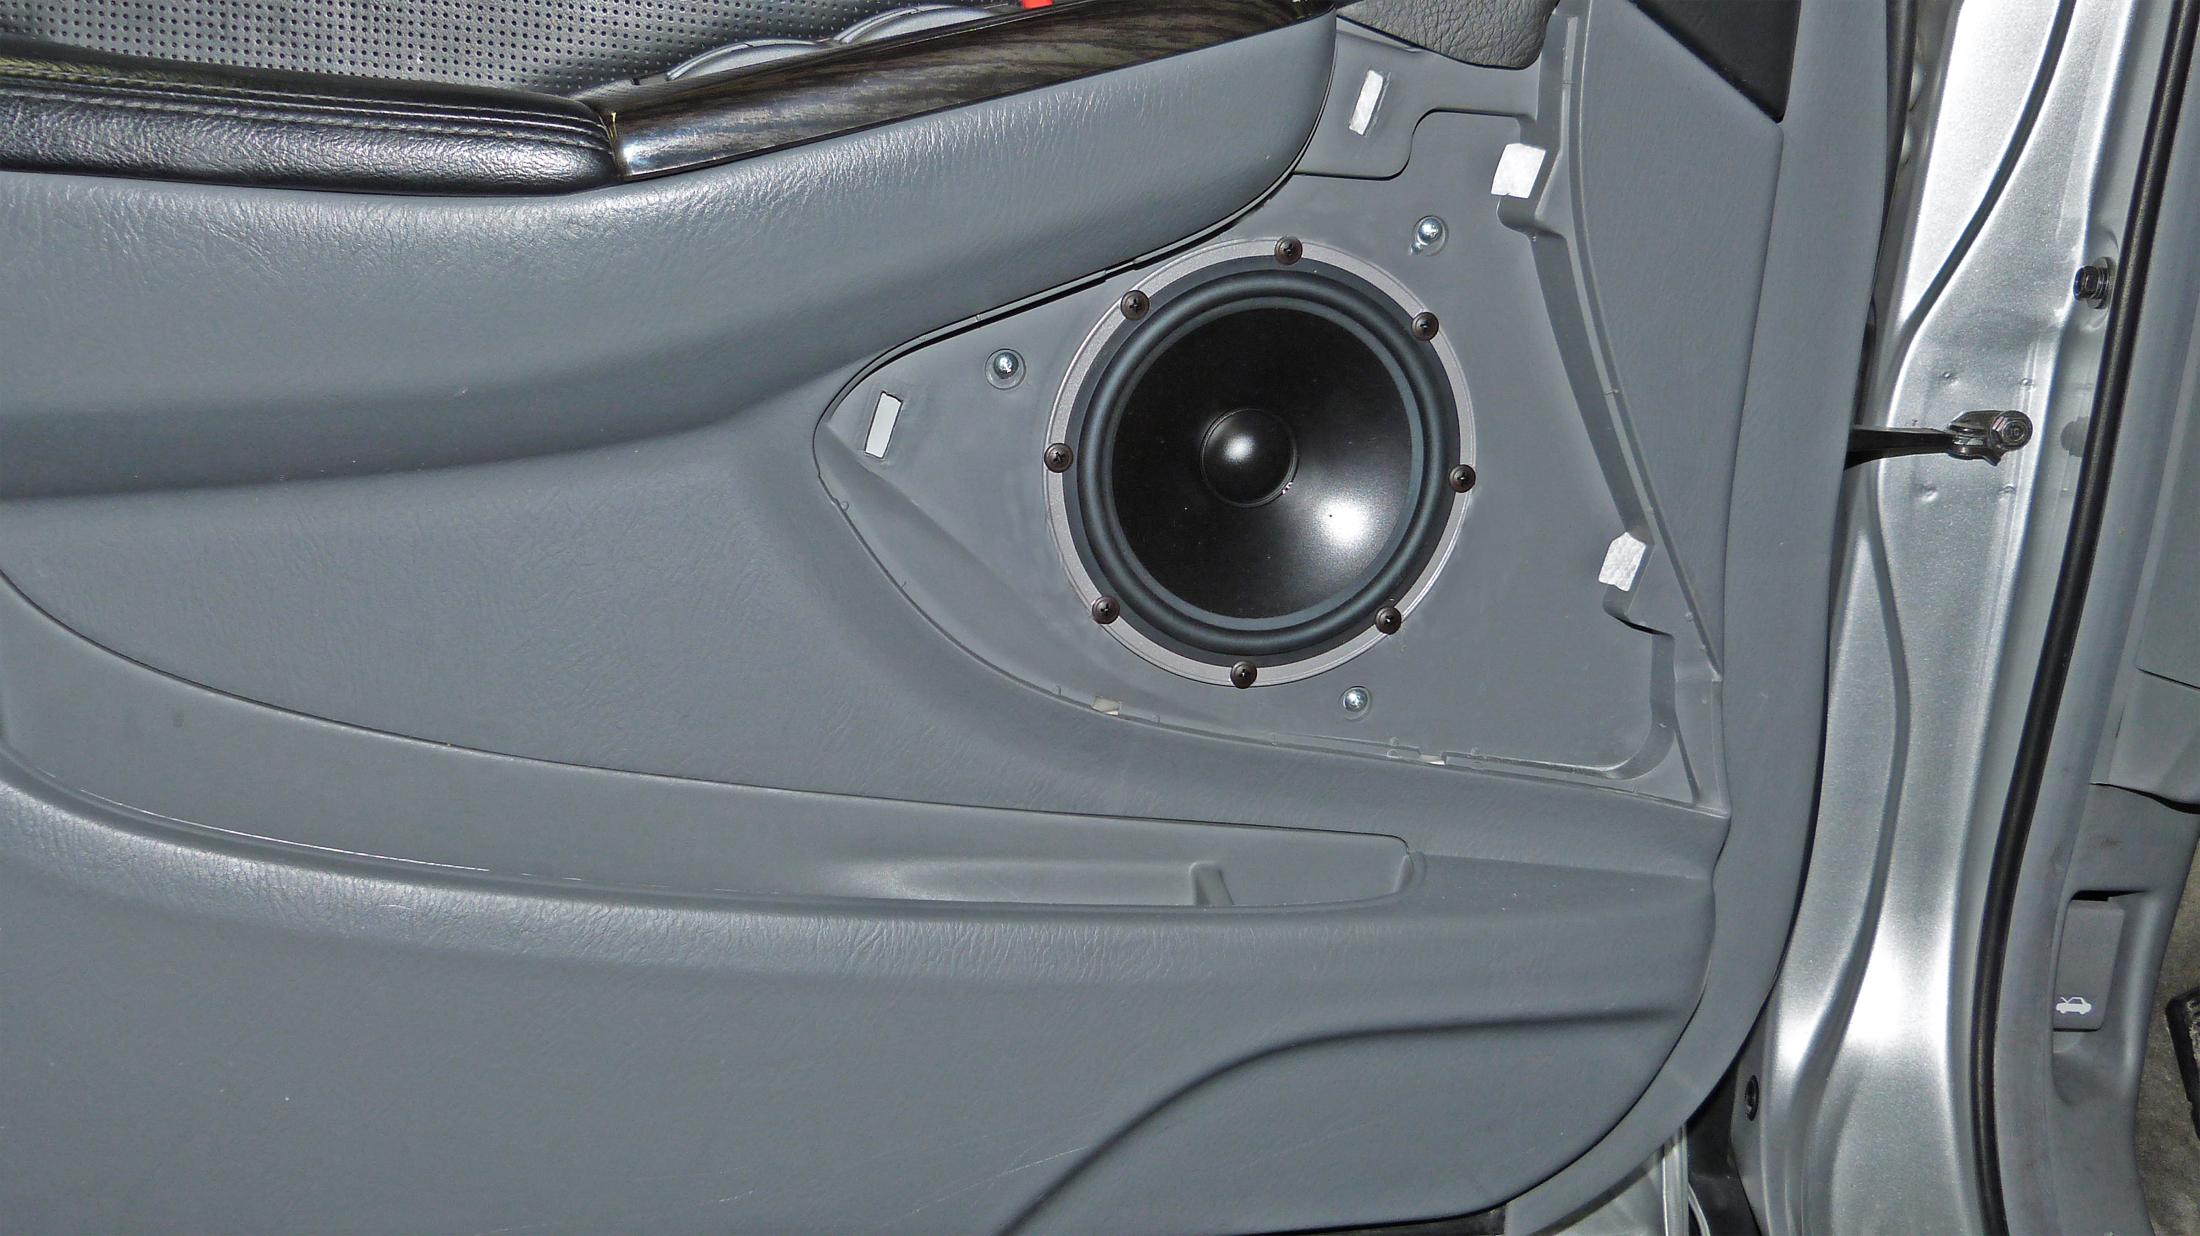 Acura Mdx Santa Fe Auto Sound